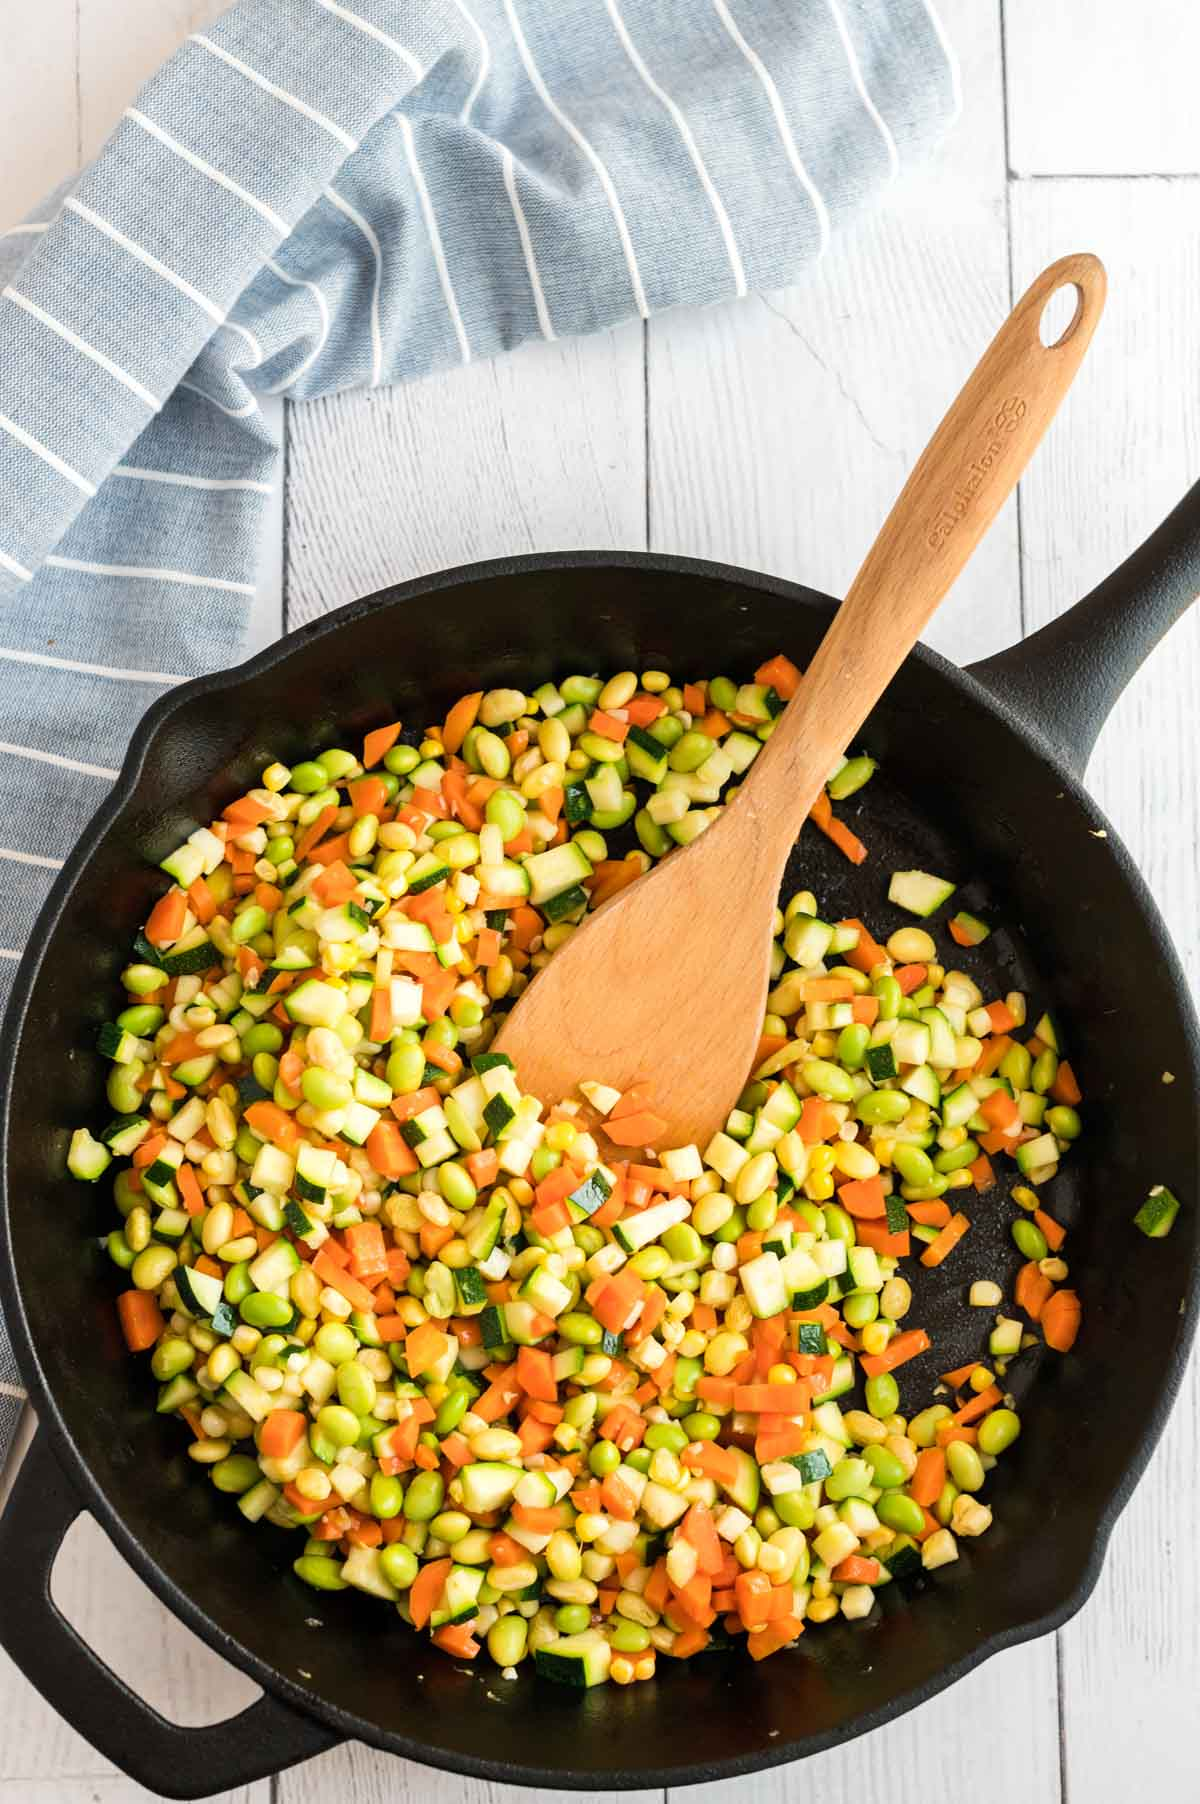 Chopped carrots, zucchini, corn, and garlic in a cast iron pan